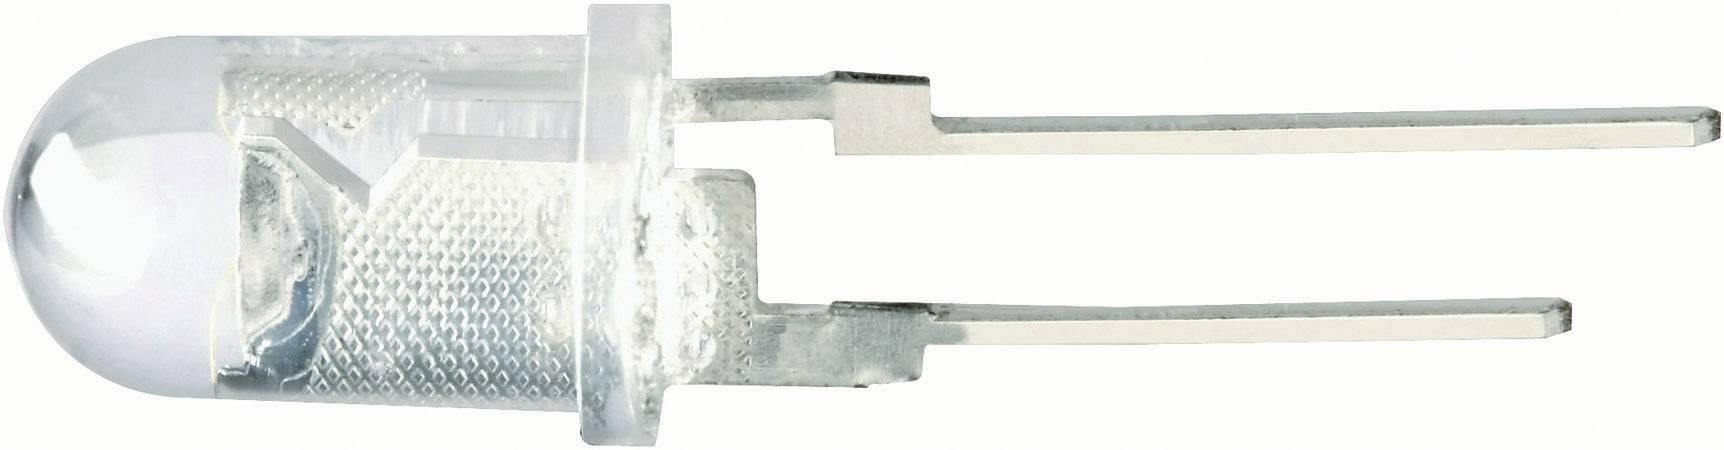 LEDsvývodmi TRU COMPONENTS guľatý, 5 mm, 75 °, 100 mA, 14000 mcd, 3.5 V, biela